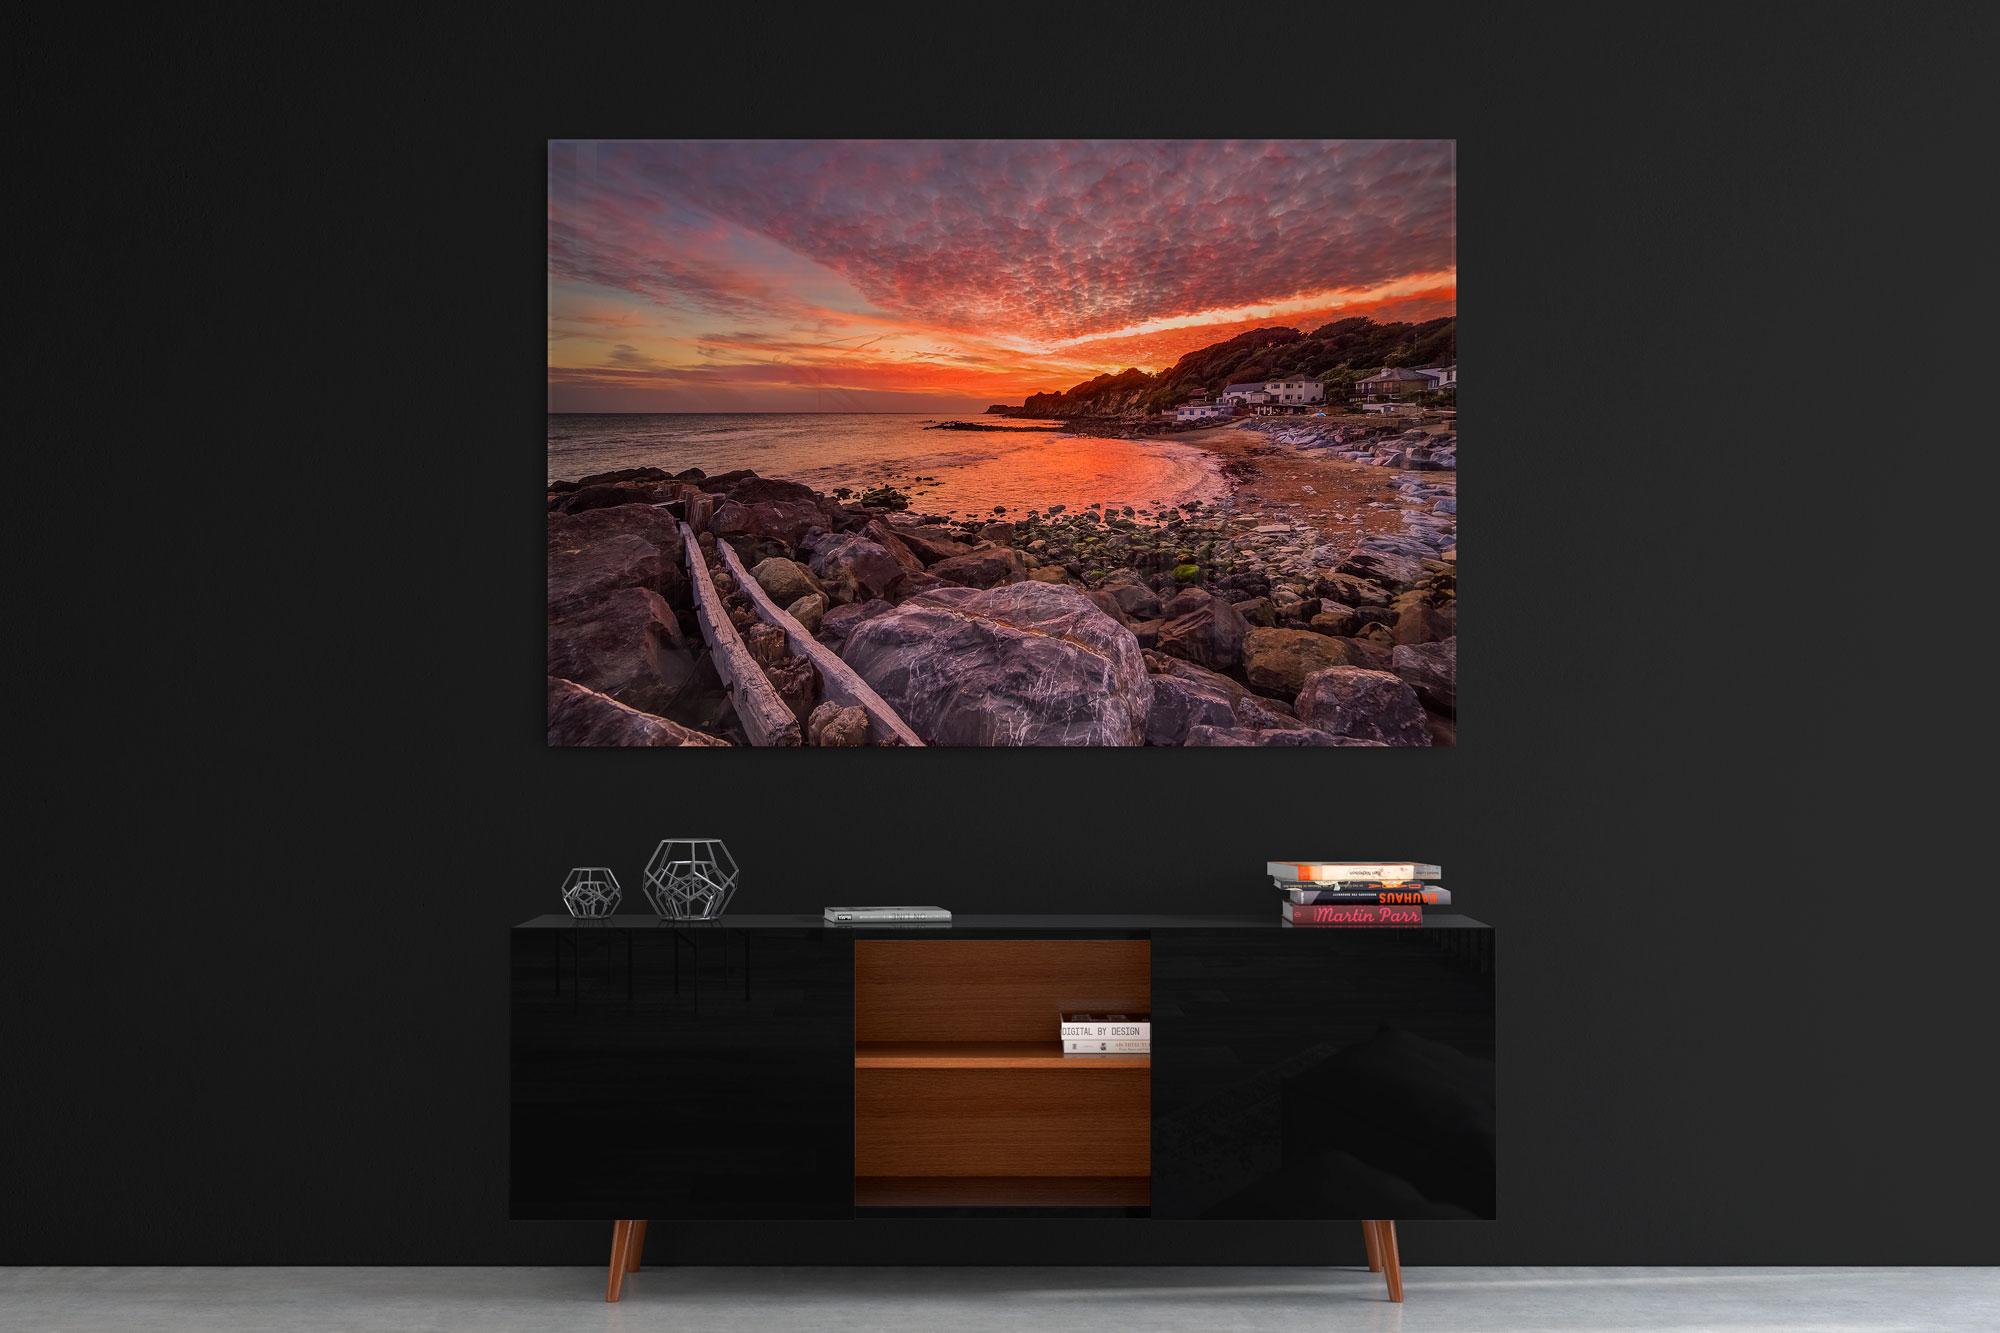 Steephill-Cove-2015-2-Acrylic-Print.jpg